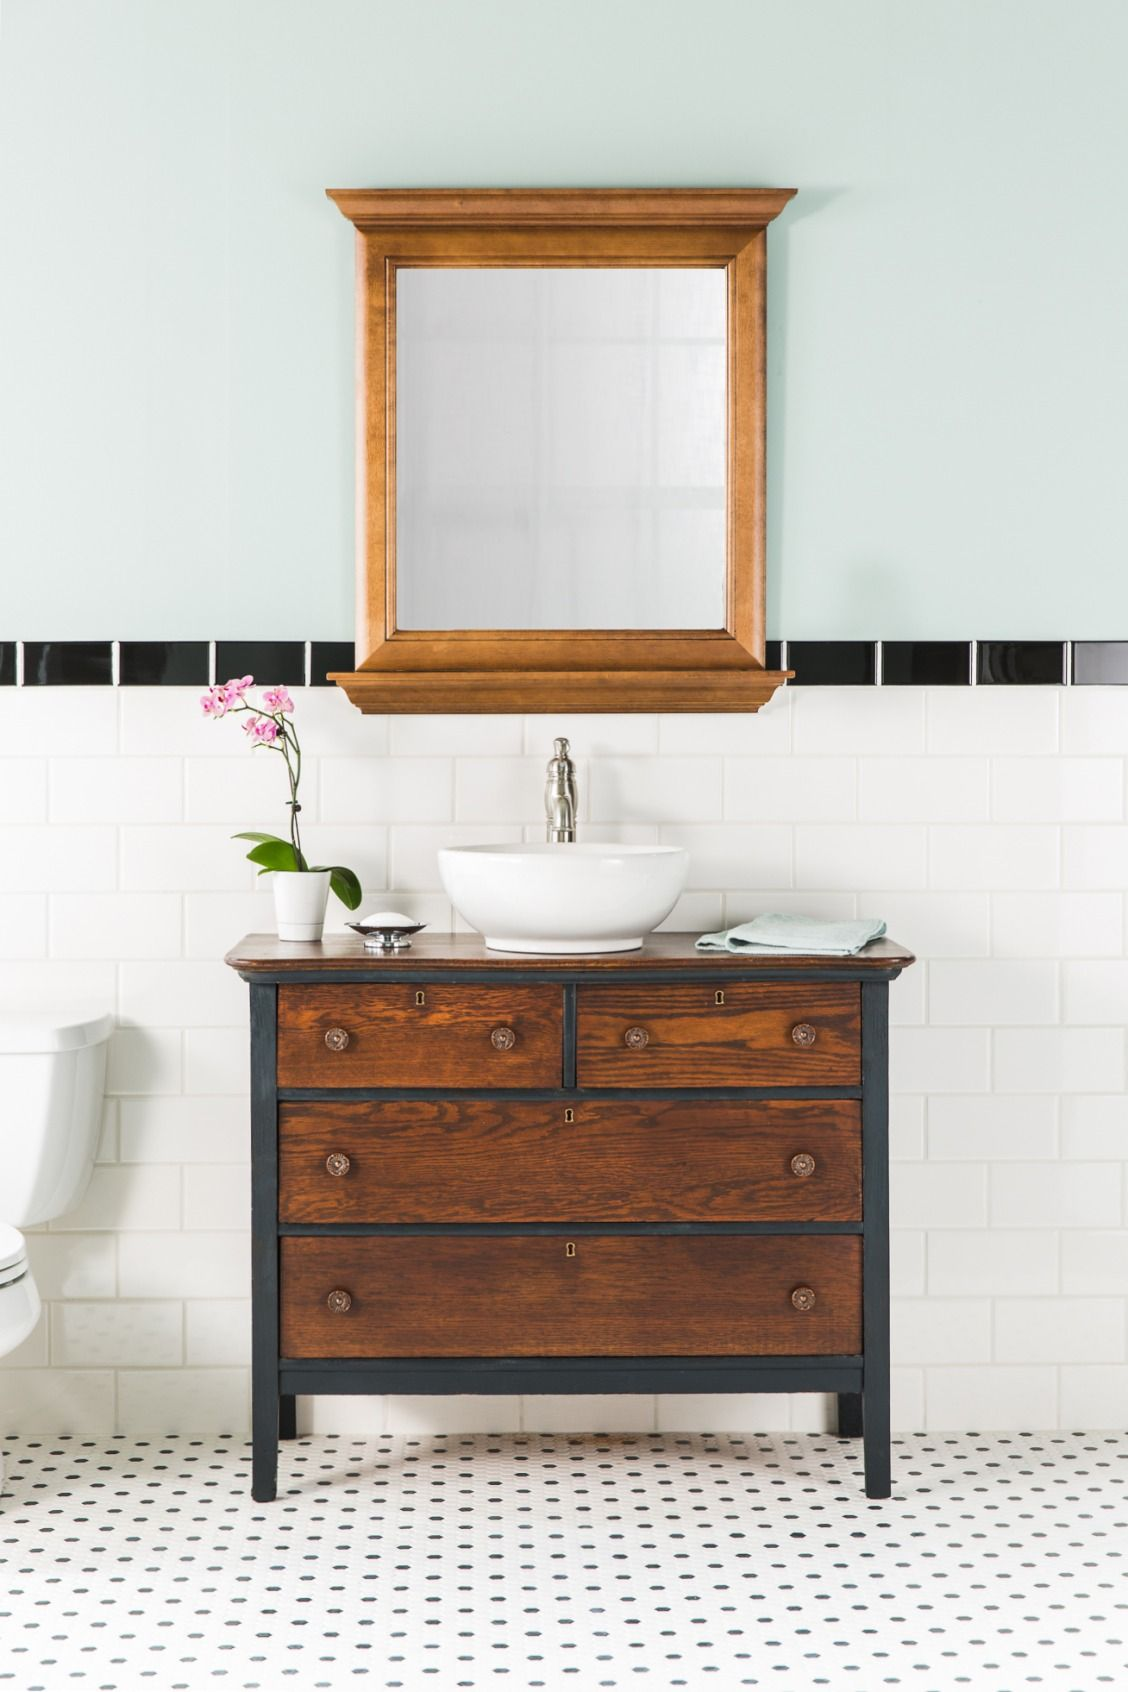 Diy Projects And Ideas Small Bathroom Vanities Rustic Bathroom